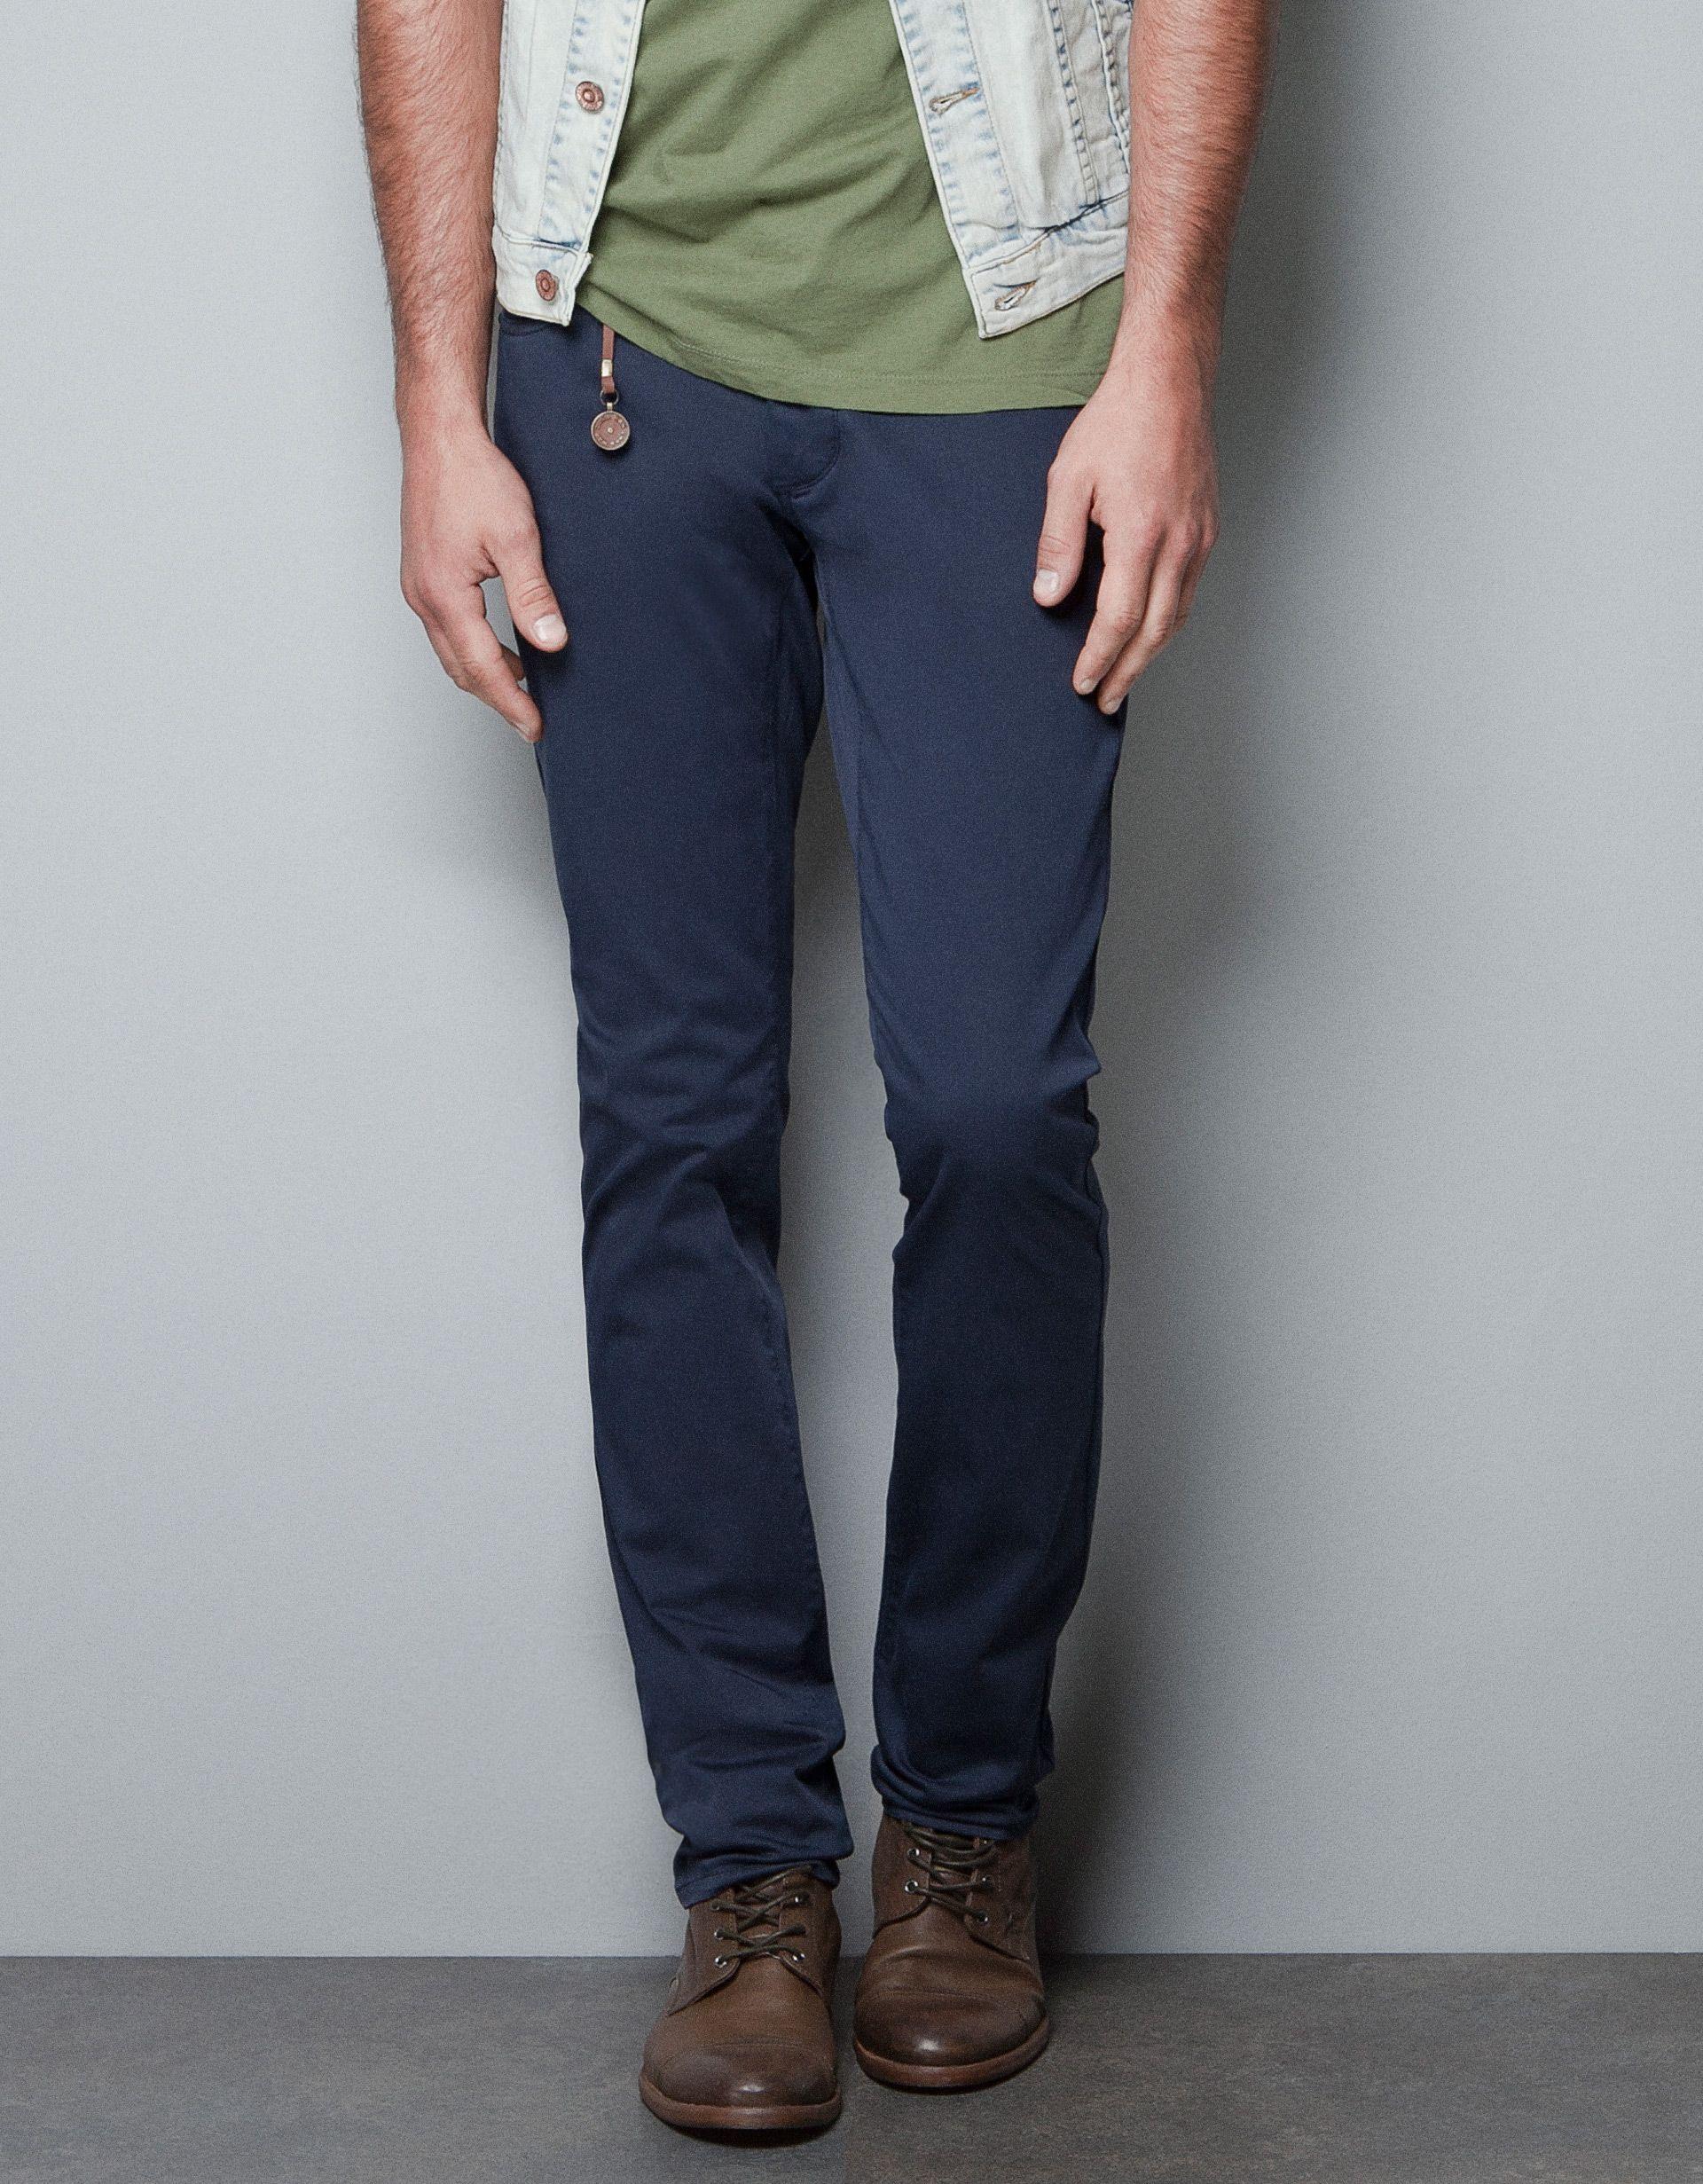 18e838b0 SLIM FIT TROUSERS - Trousers - Man - ZARA United States | Minimalism ...